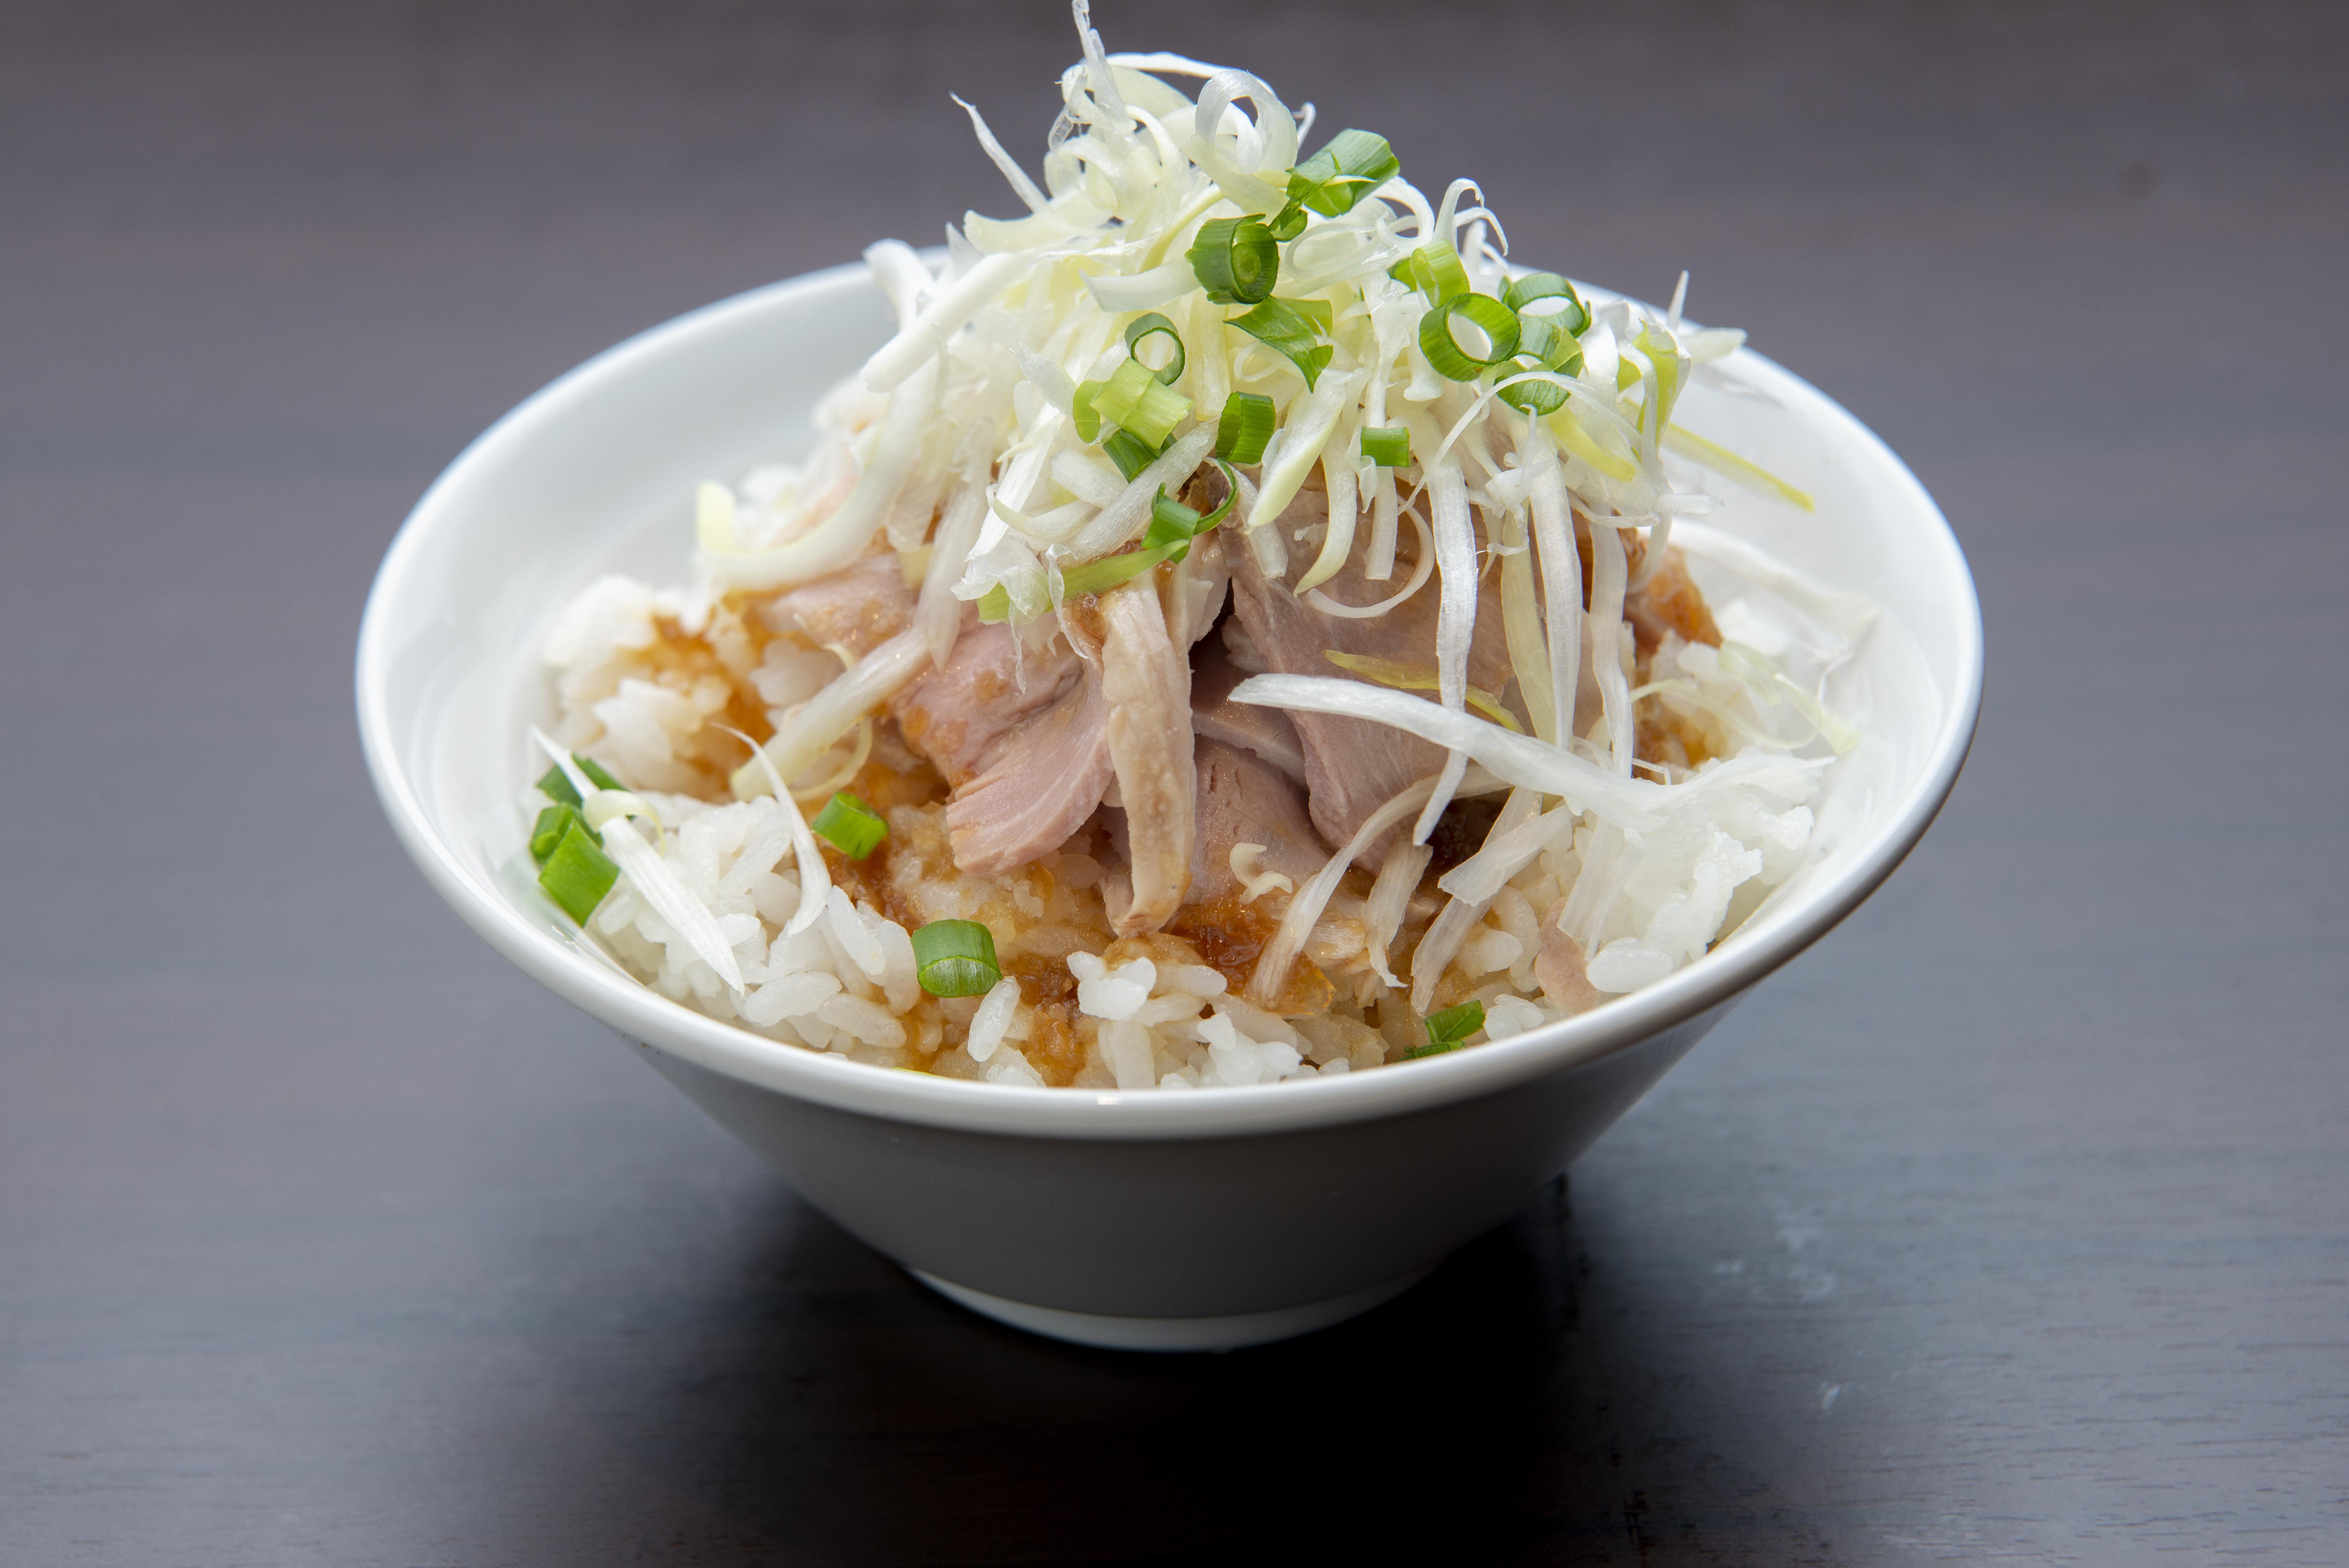 http://www.joqr.co.jp/hama-story/_DAN9647.jpg